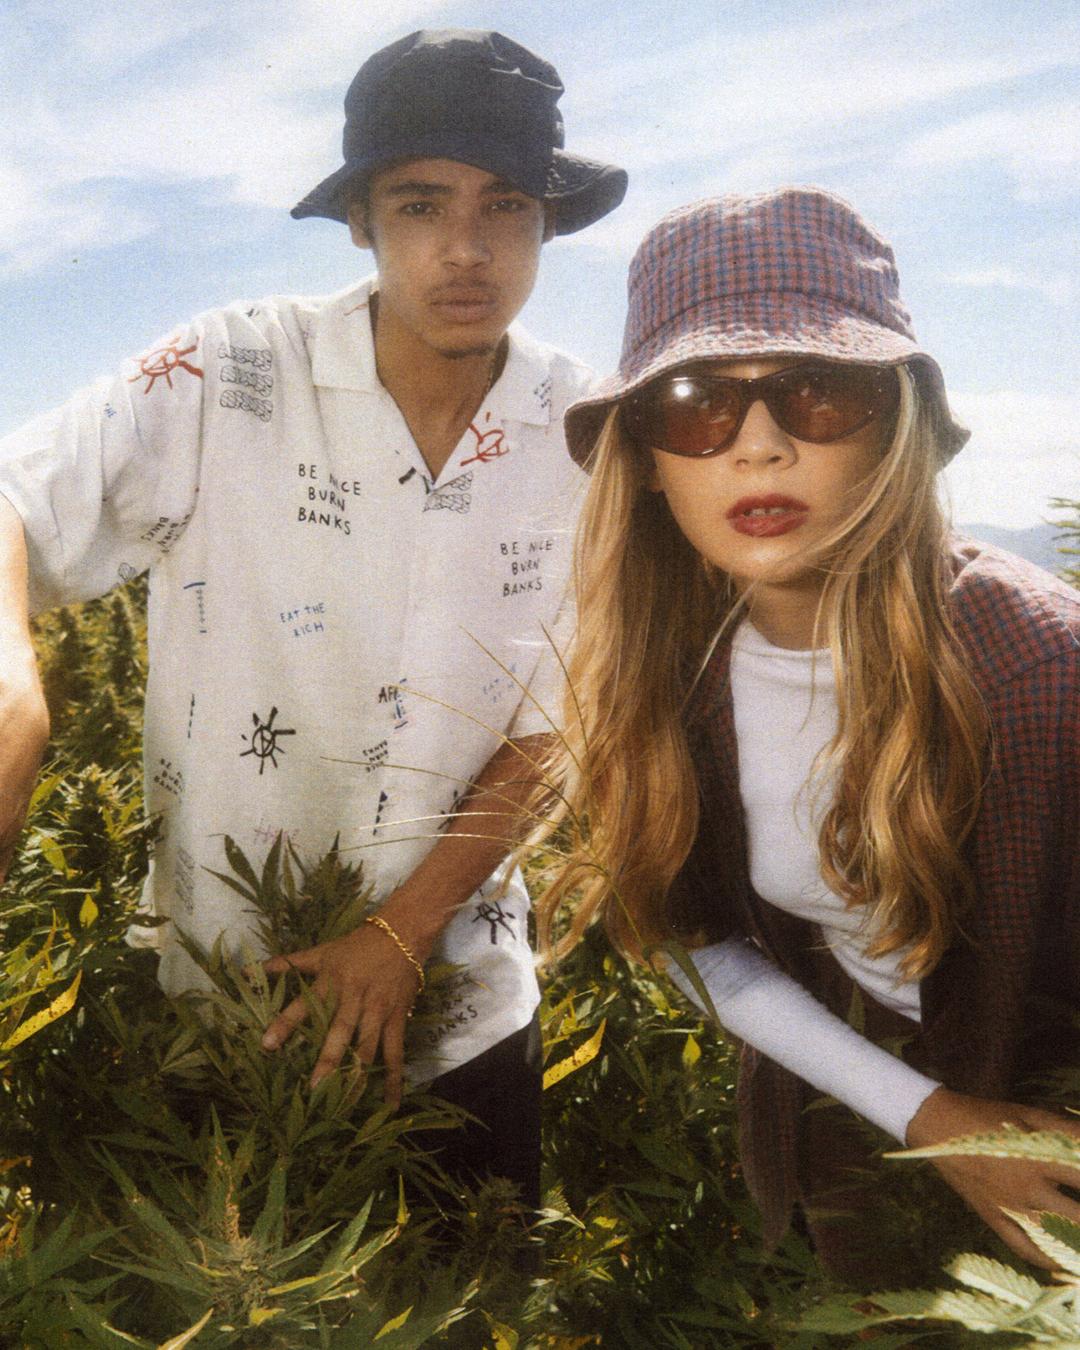 two people in streetwear staring down barrel of camera